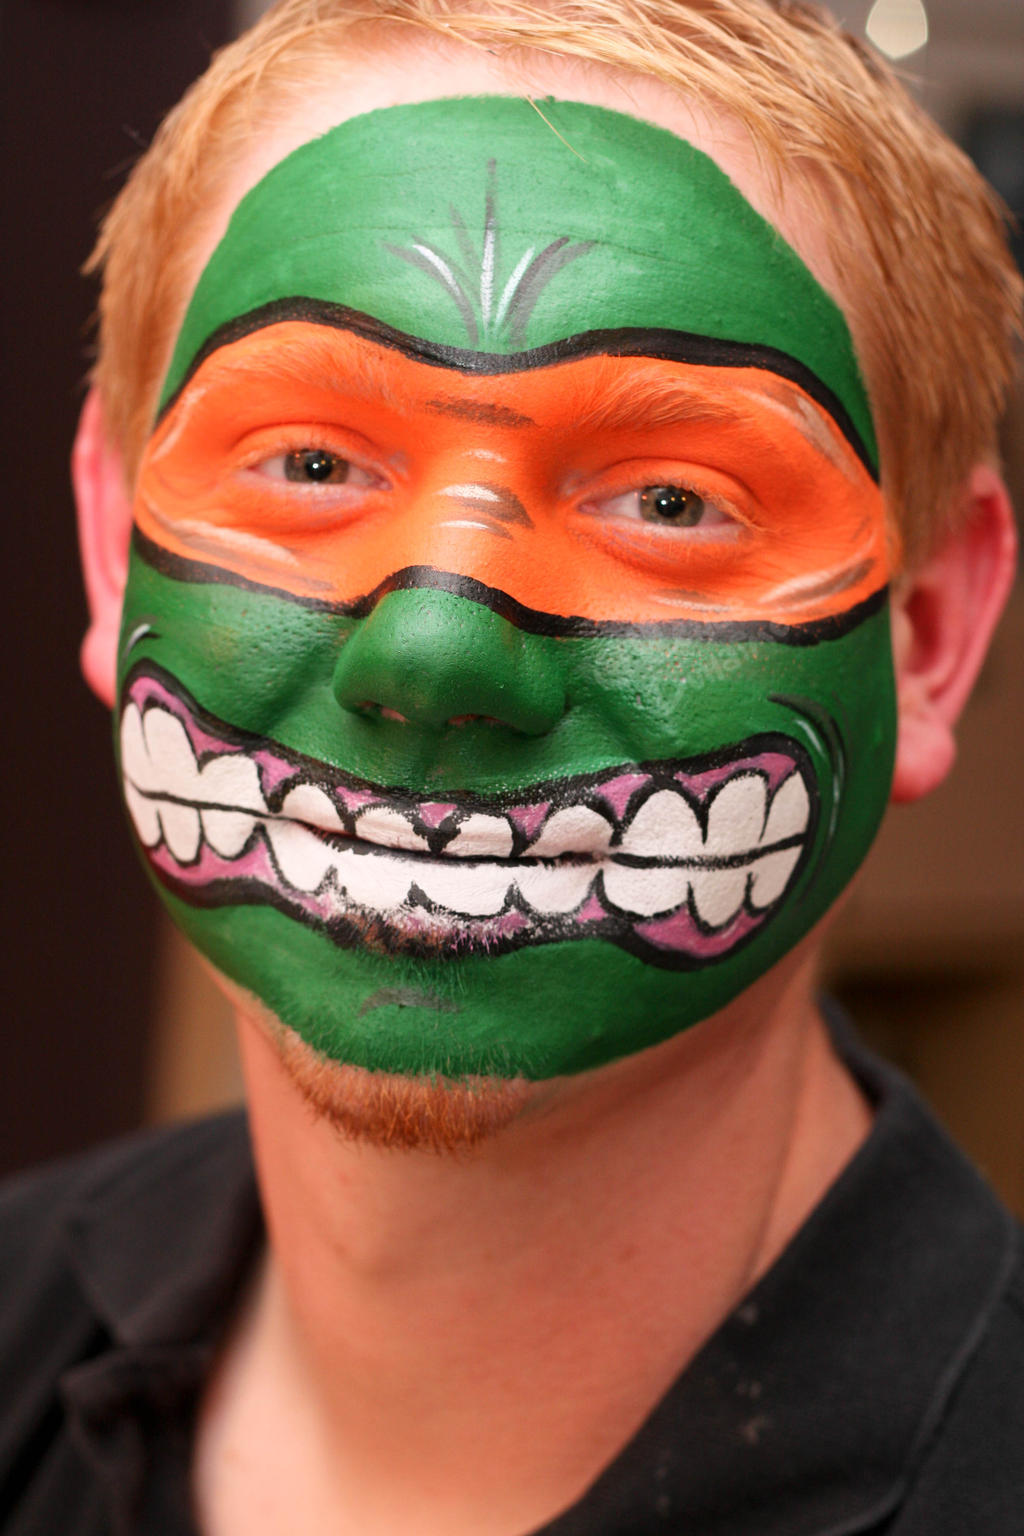 Ninja Turtle - Michaelangelo by renduh-facepaint on DeviantArt